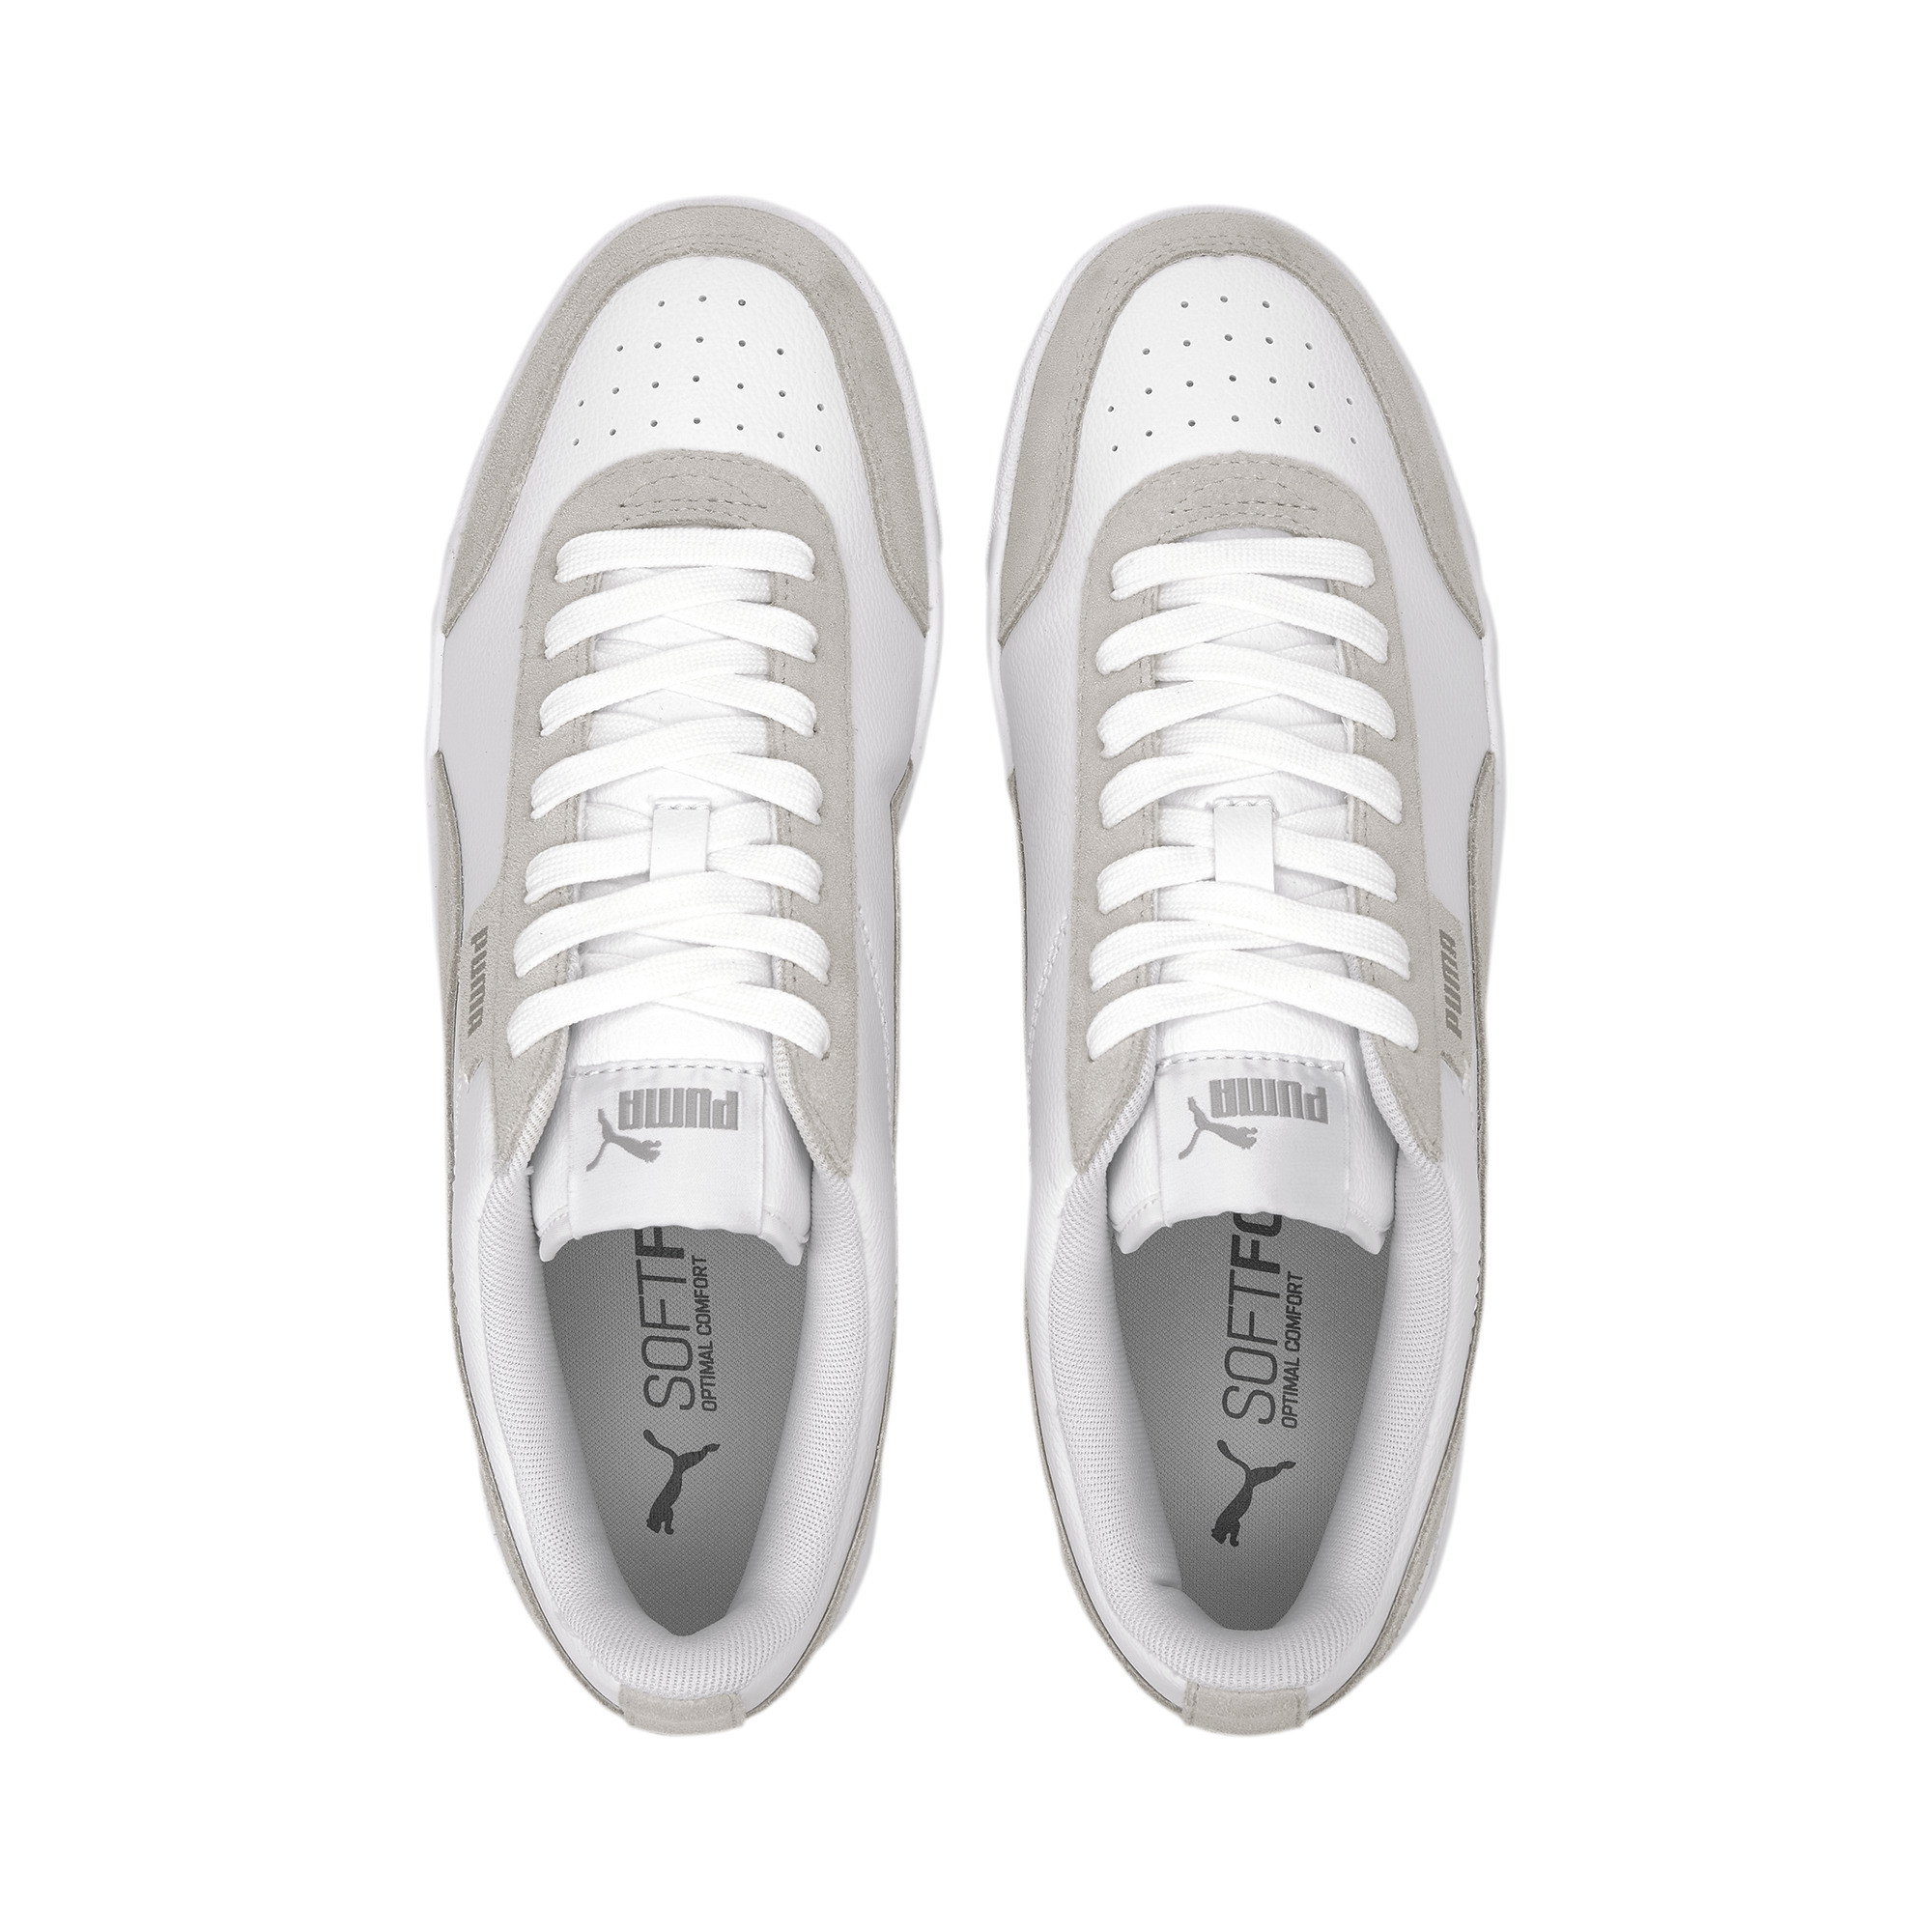 Indexbild 13 - PUMA Court Legend Lo Sneaker Unisex Schuhe Basics Neu